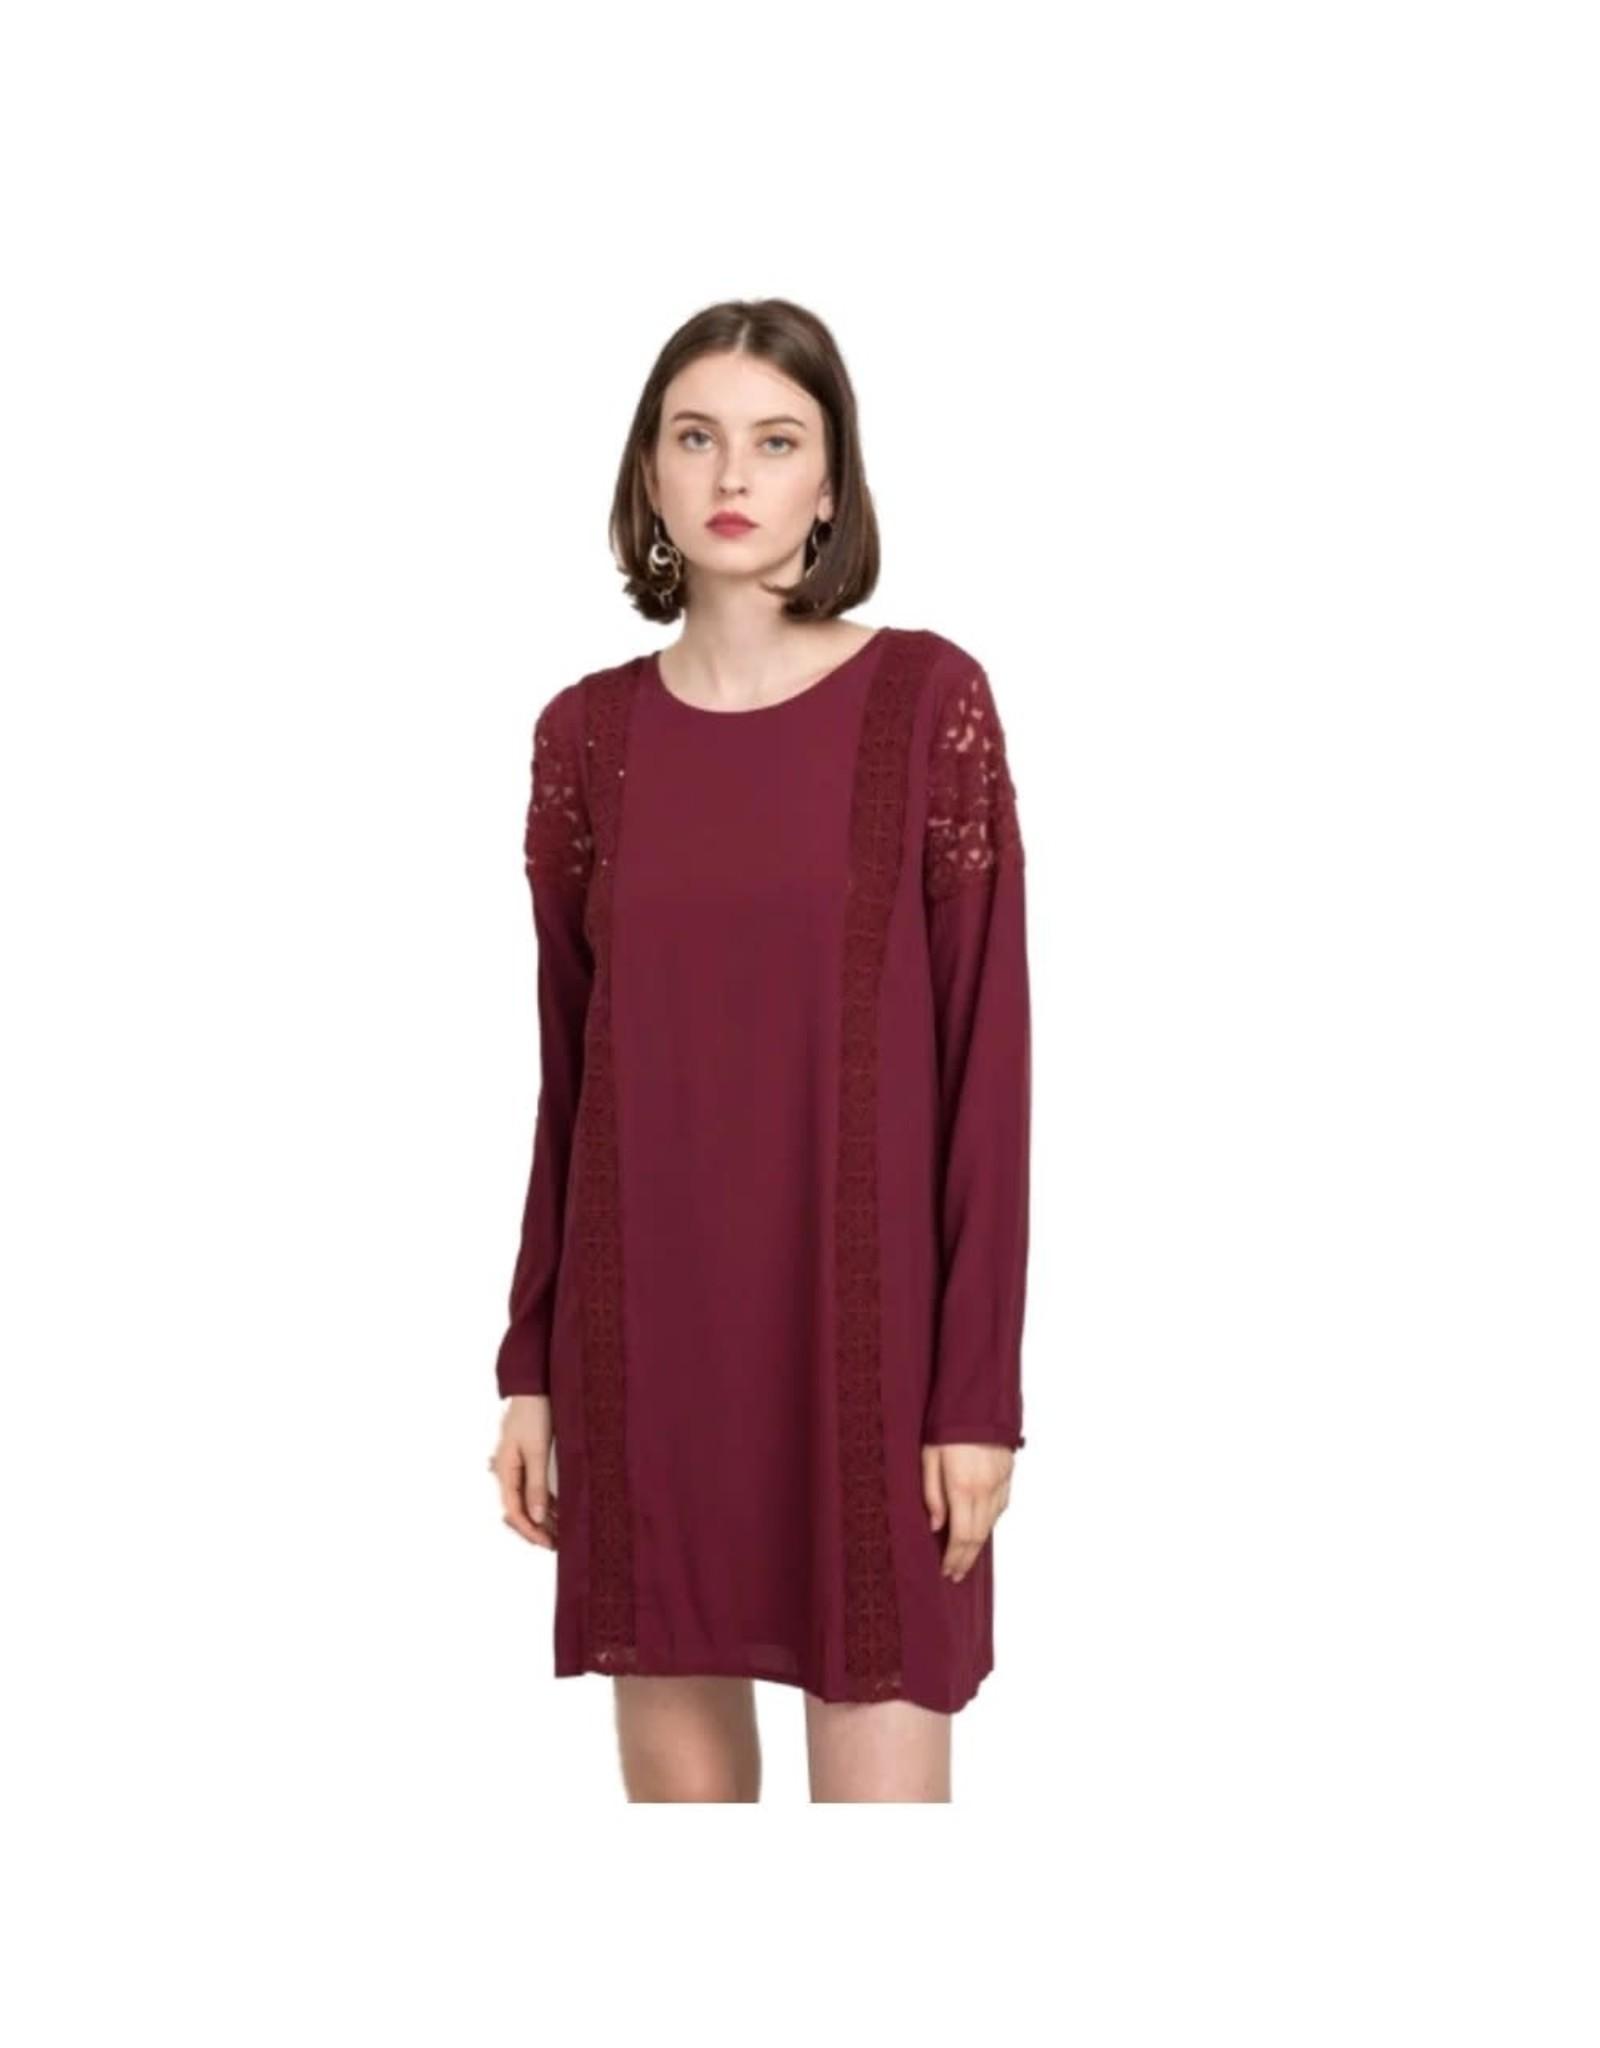 BURGUNDY LACE TRIM LONG SLEEVE SHIFT DRESS